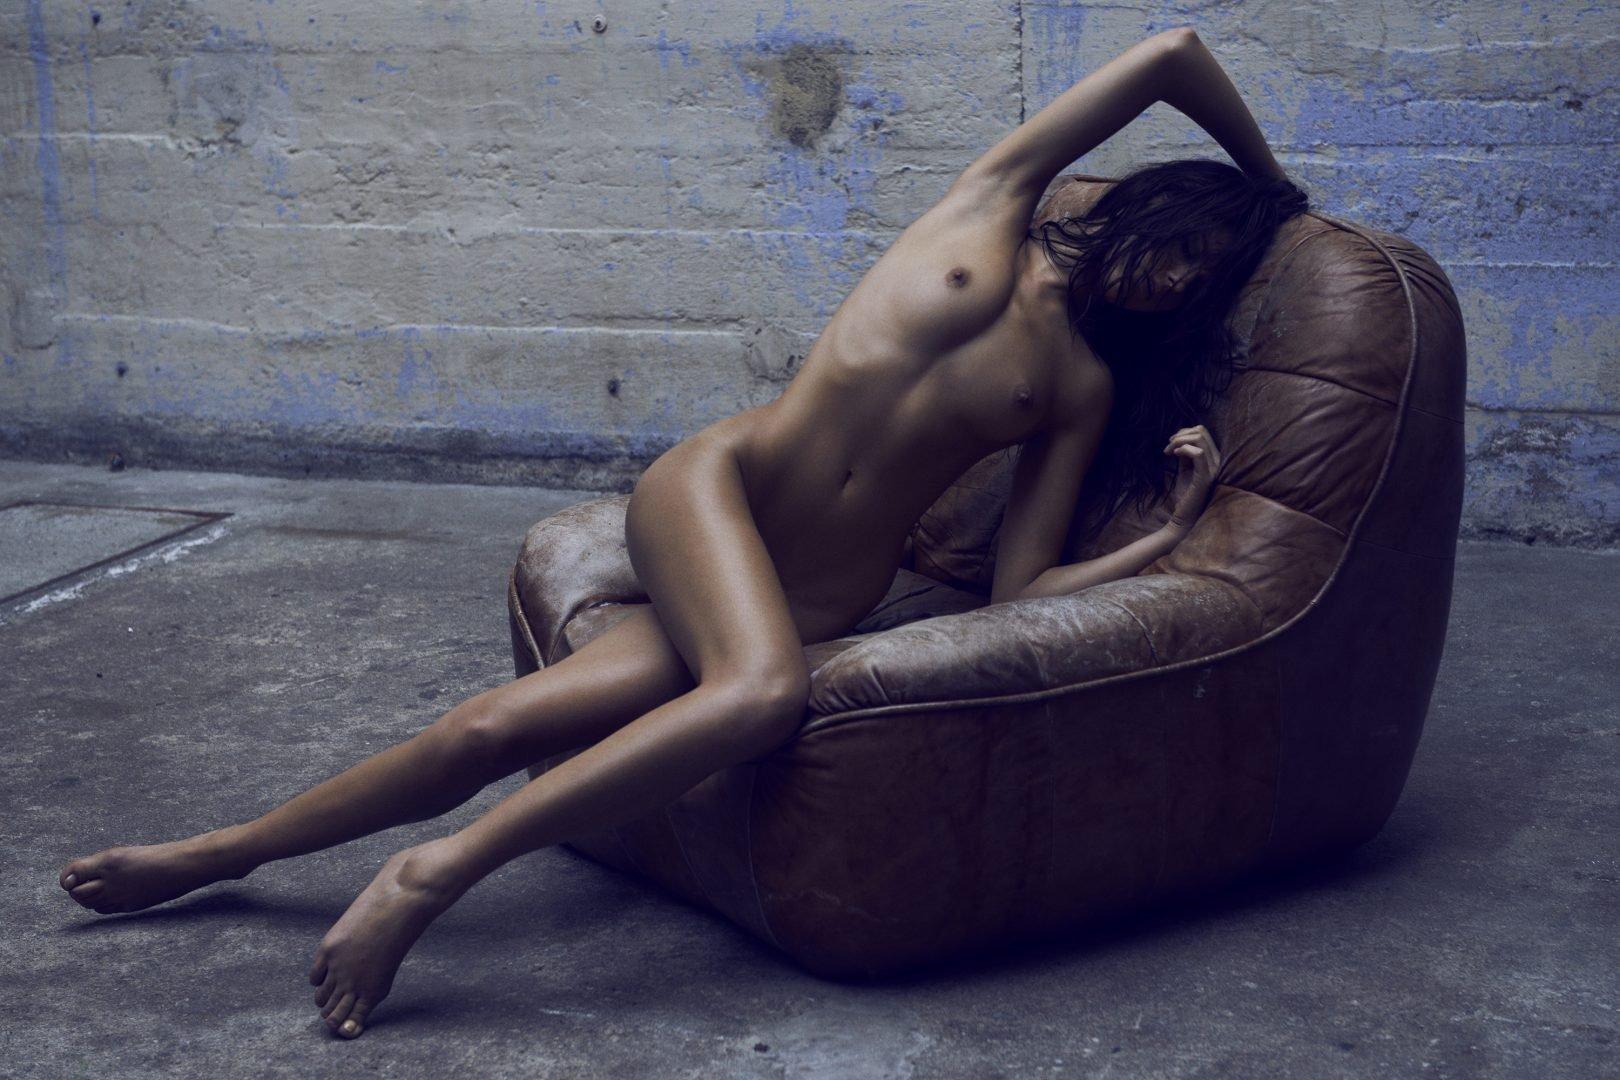 Watch Pauline moulettes nude video